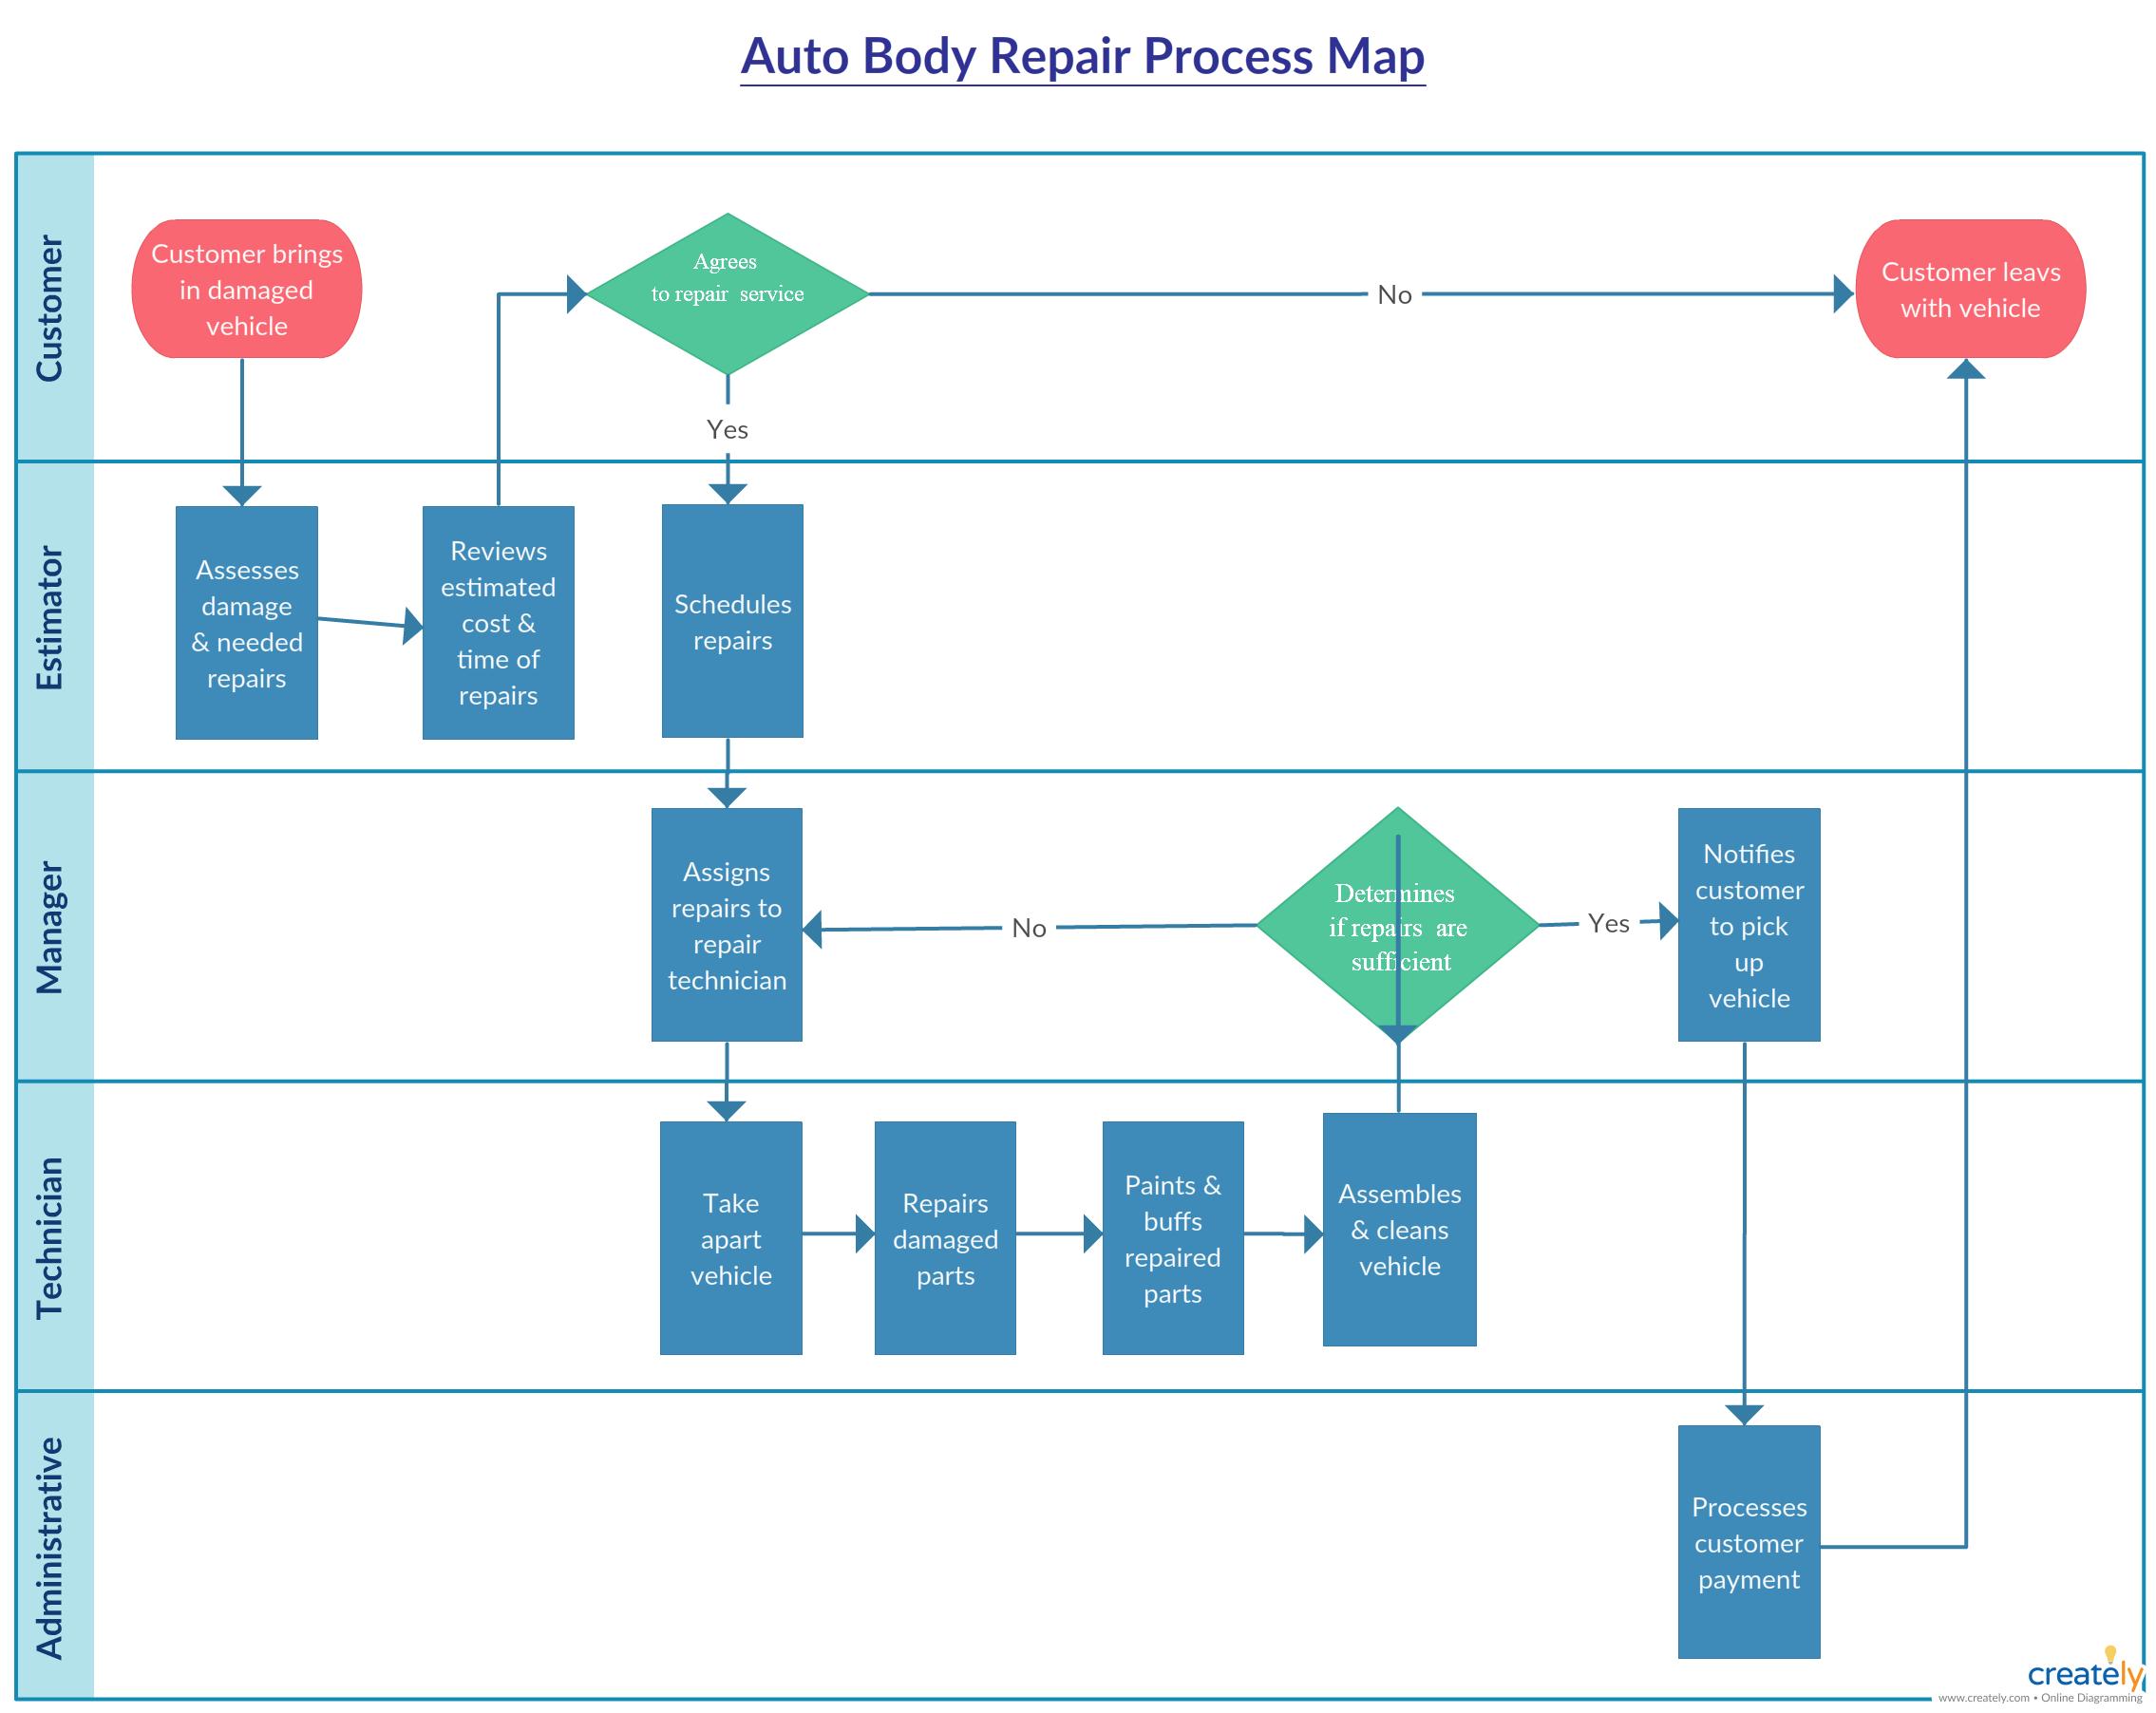 body shop repair process flowchart body shop repair process flowchart to map the auto body [ 2270 x 1804 Pixel ]